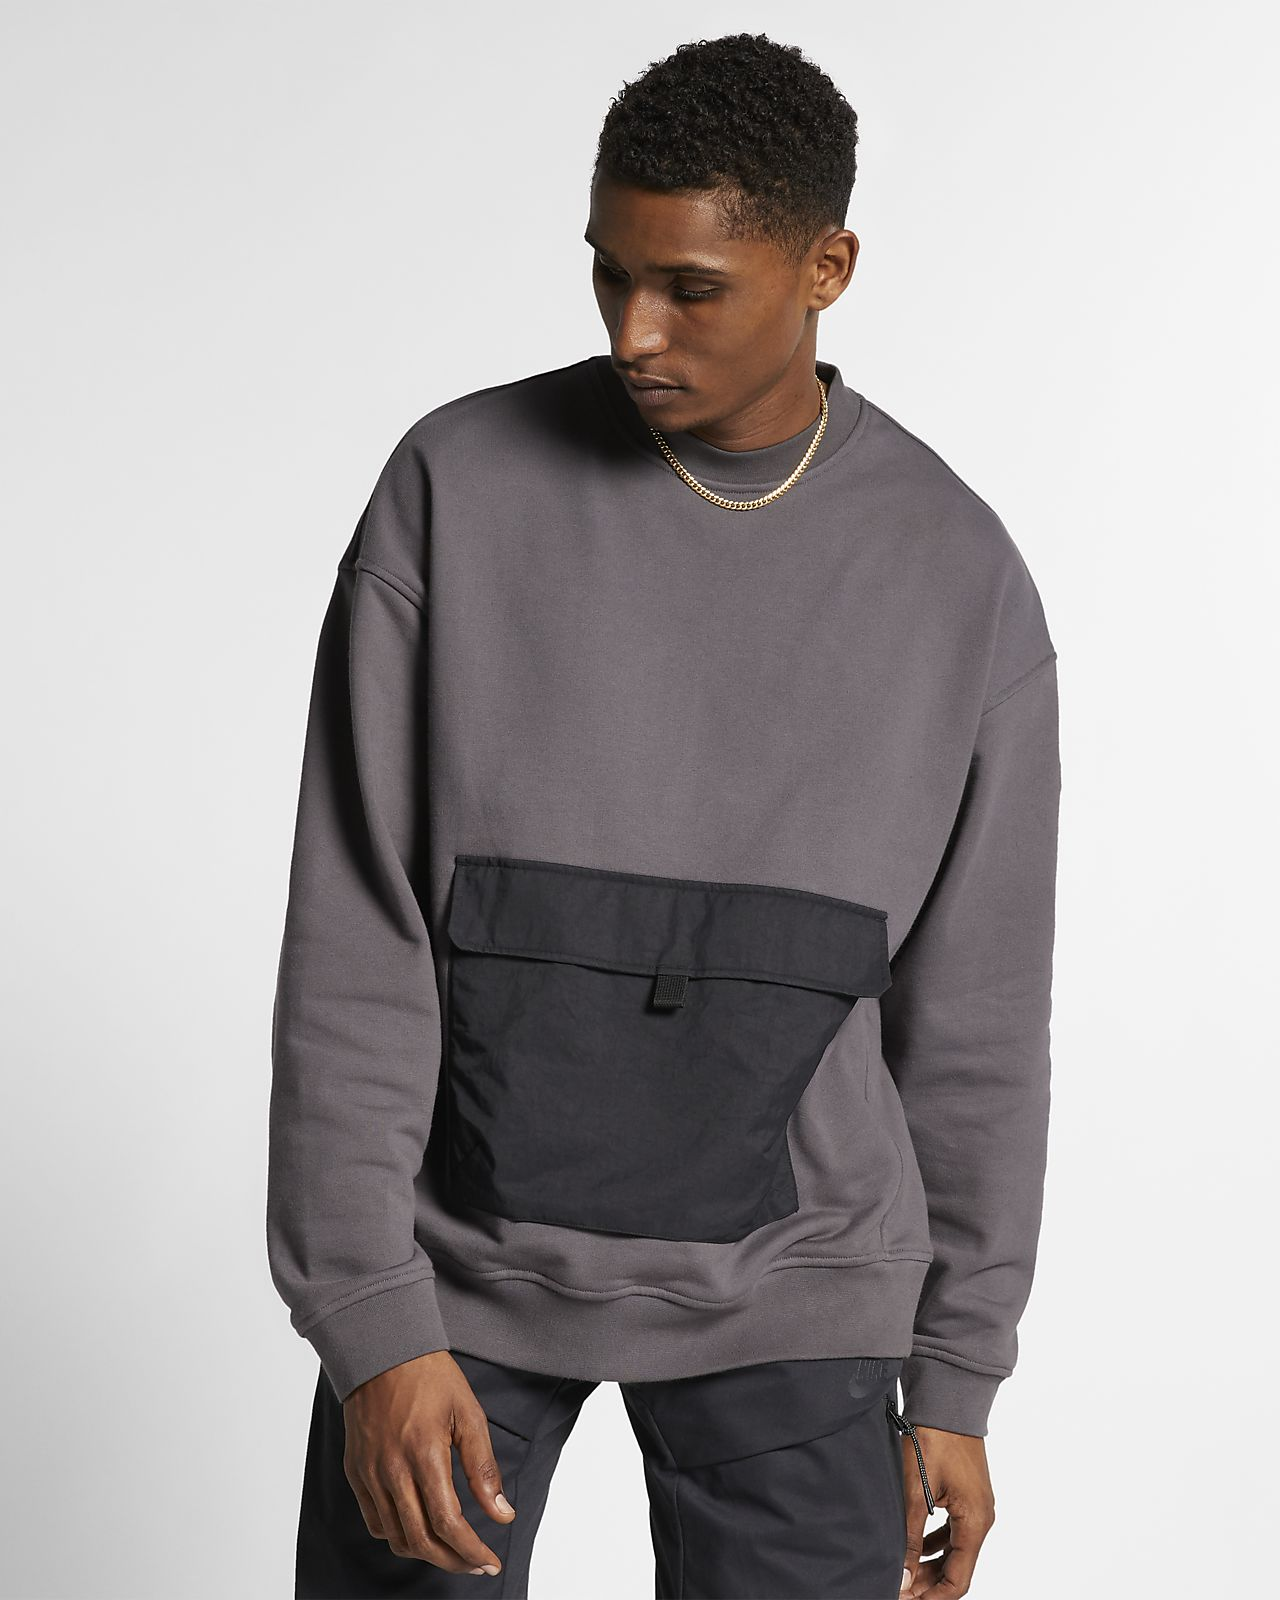 Nike Quest Langarm-Fleece-Rundhalsshirt